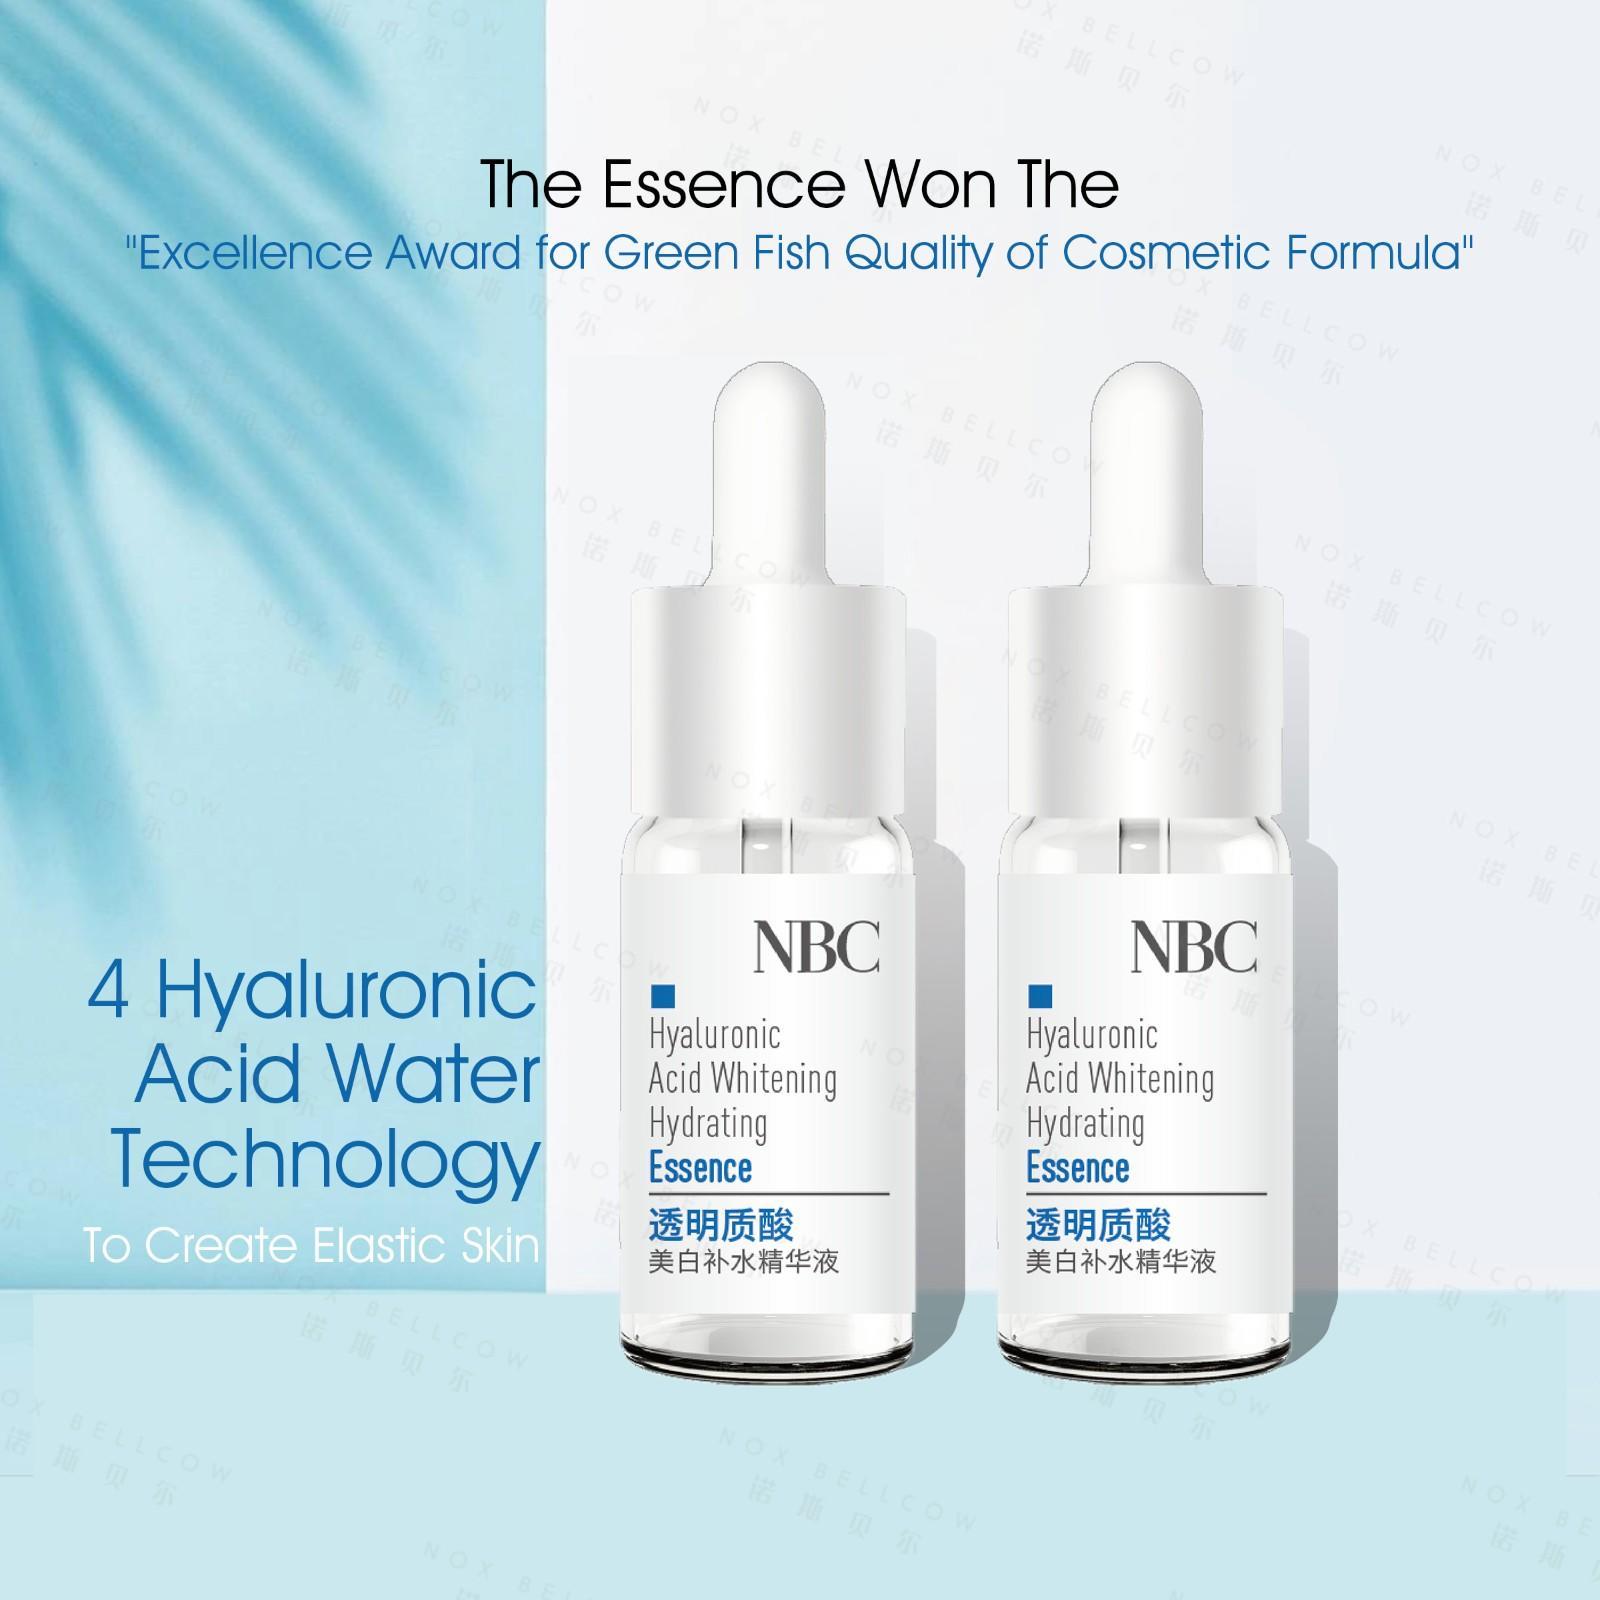 essence skin care for skincare-1